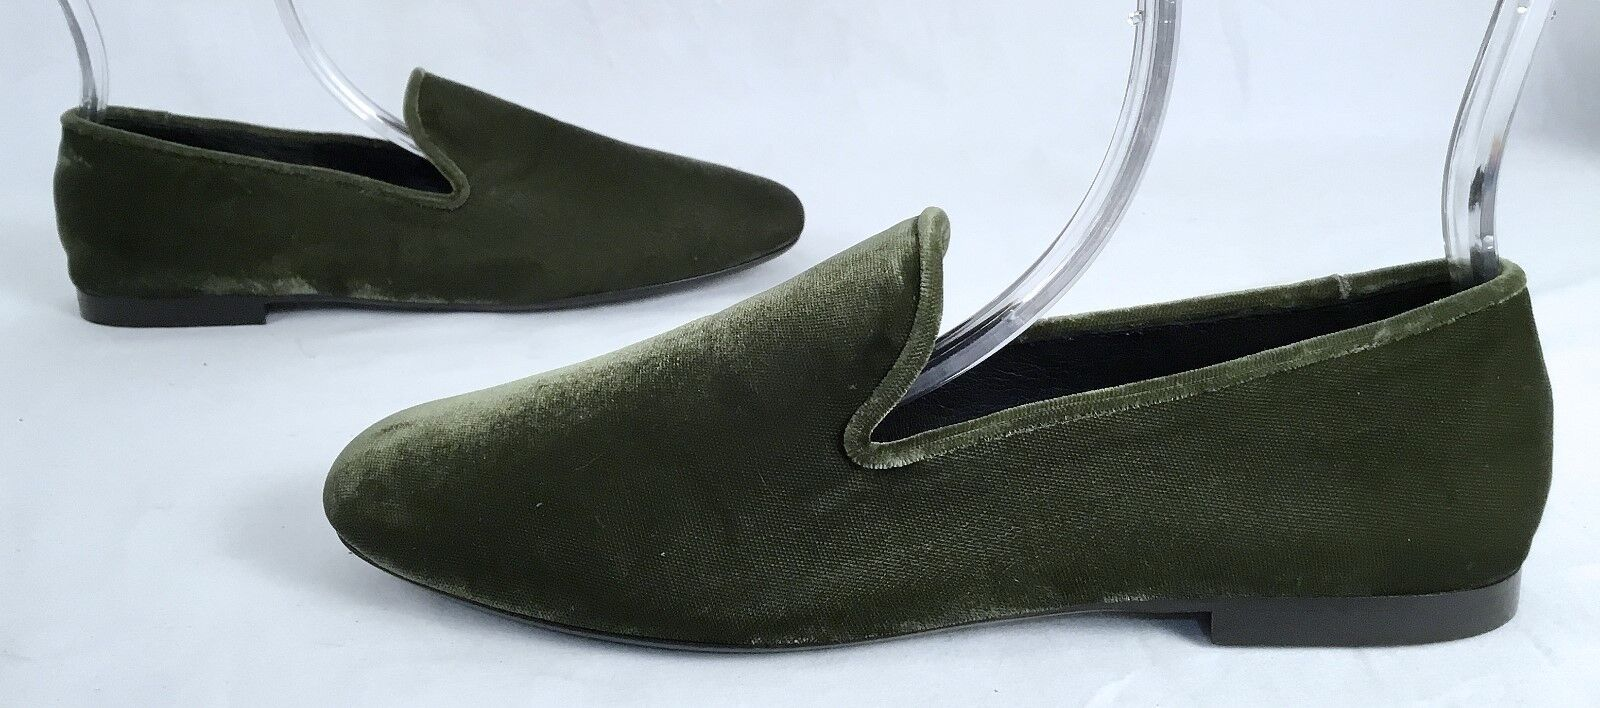 NEW   Vince 'Bray' Velvet Smoking 298-(J4) Loafers -Moss -Größe-US 7.5/EU37.5- 298-(J4) Smoking b46c9f